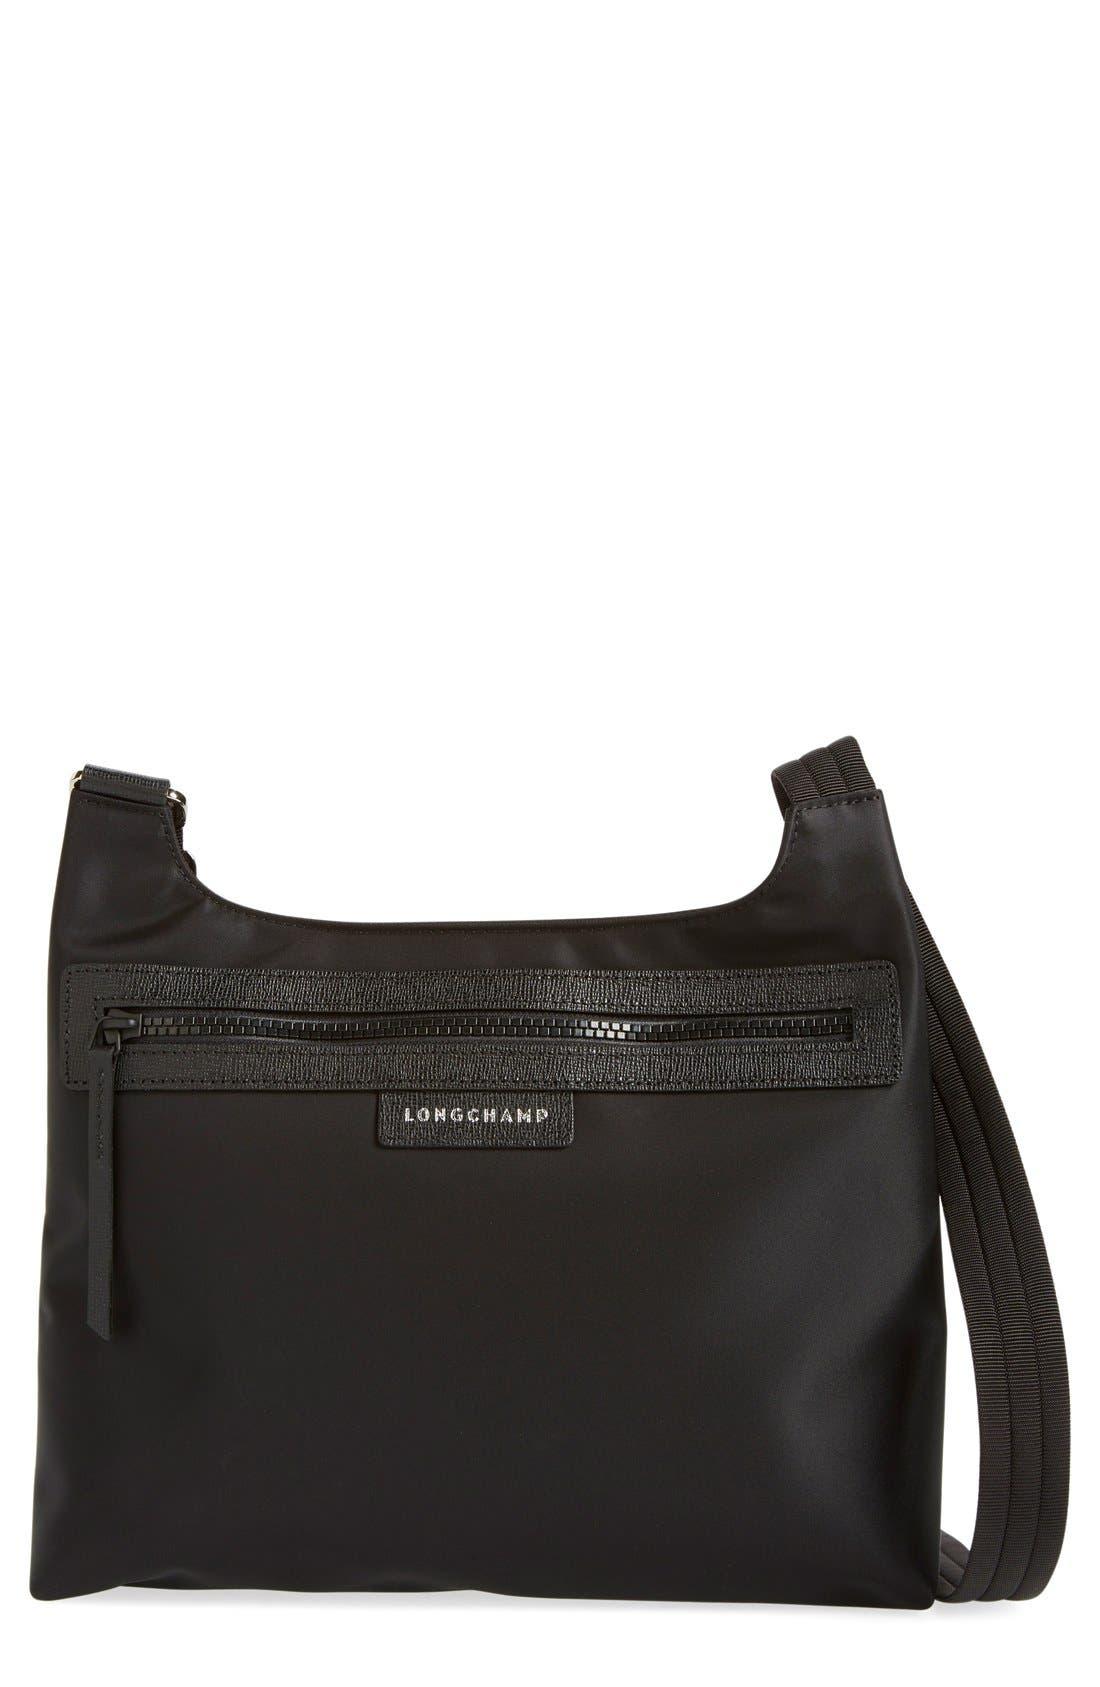 'Le Pliage Neo' Nylon Crossbody Bag,                         Main,                         color, BLACK